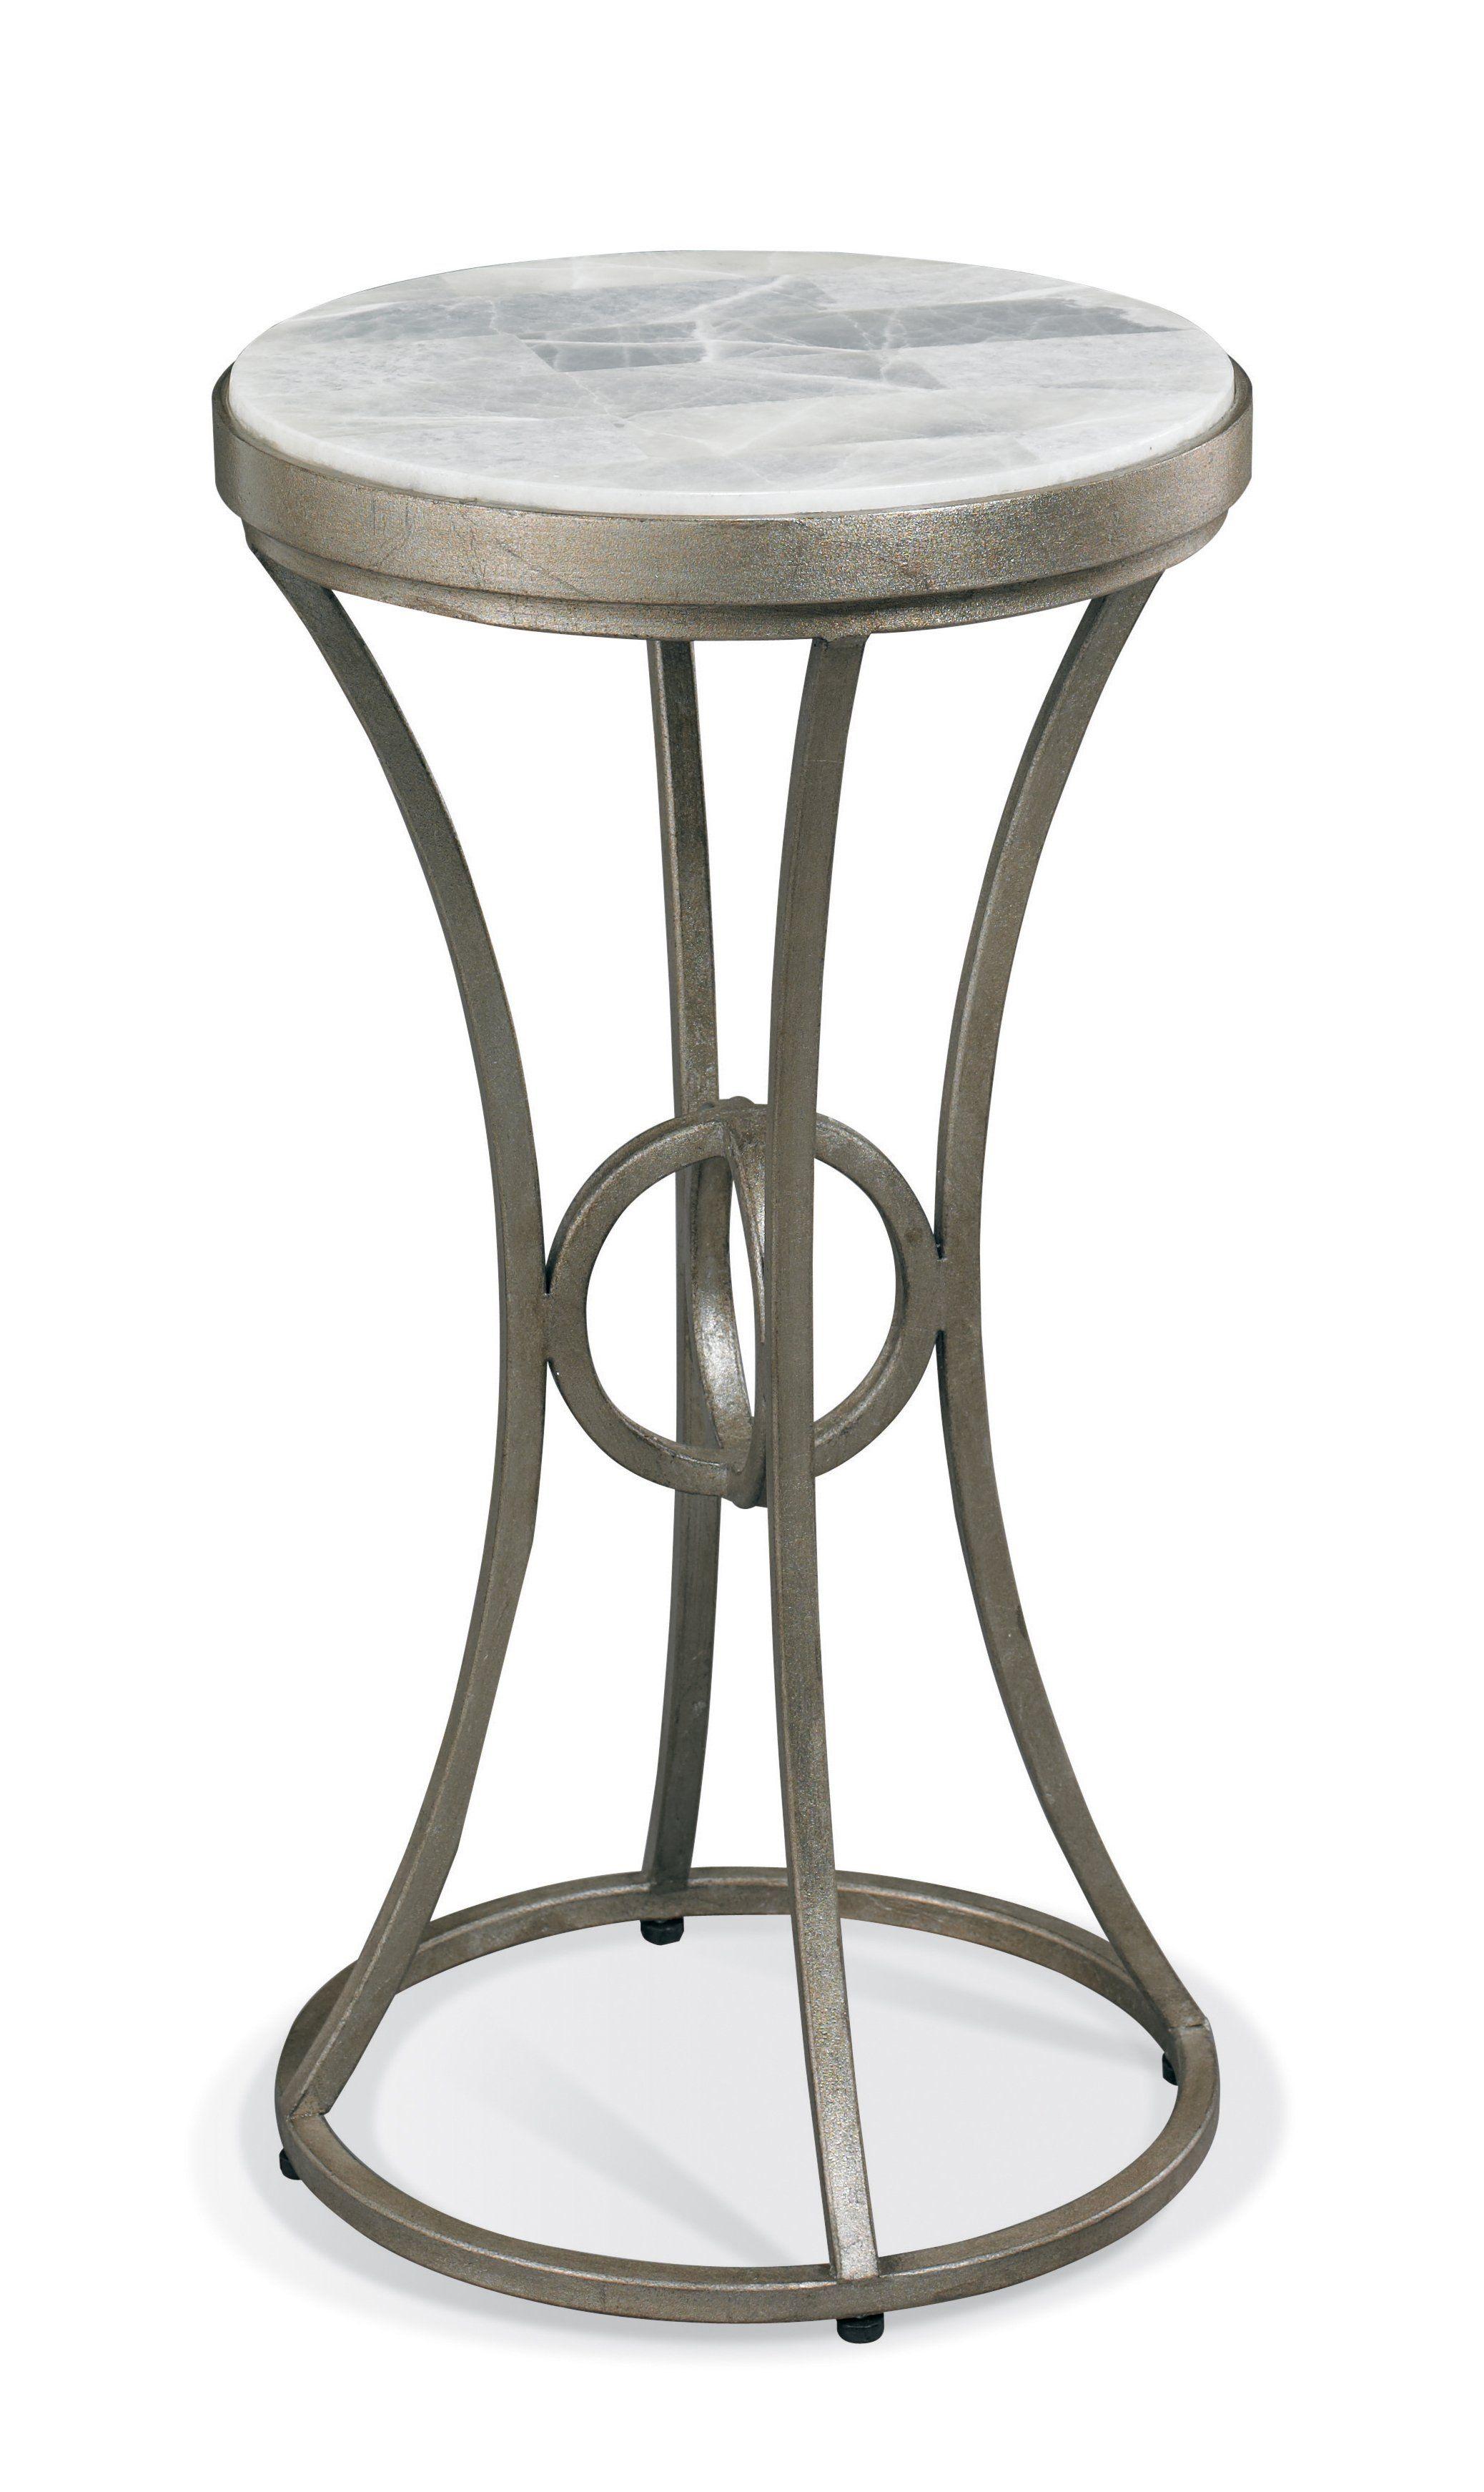 Gray Round Accent Table Grottepastenaecollepardo